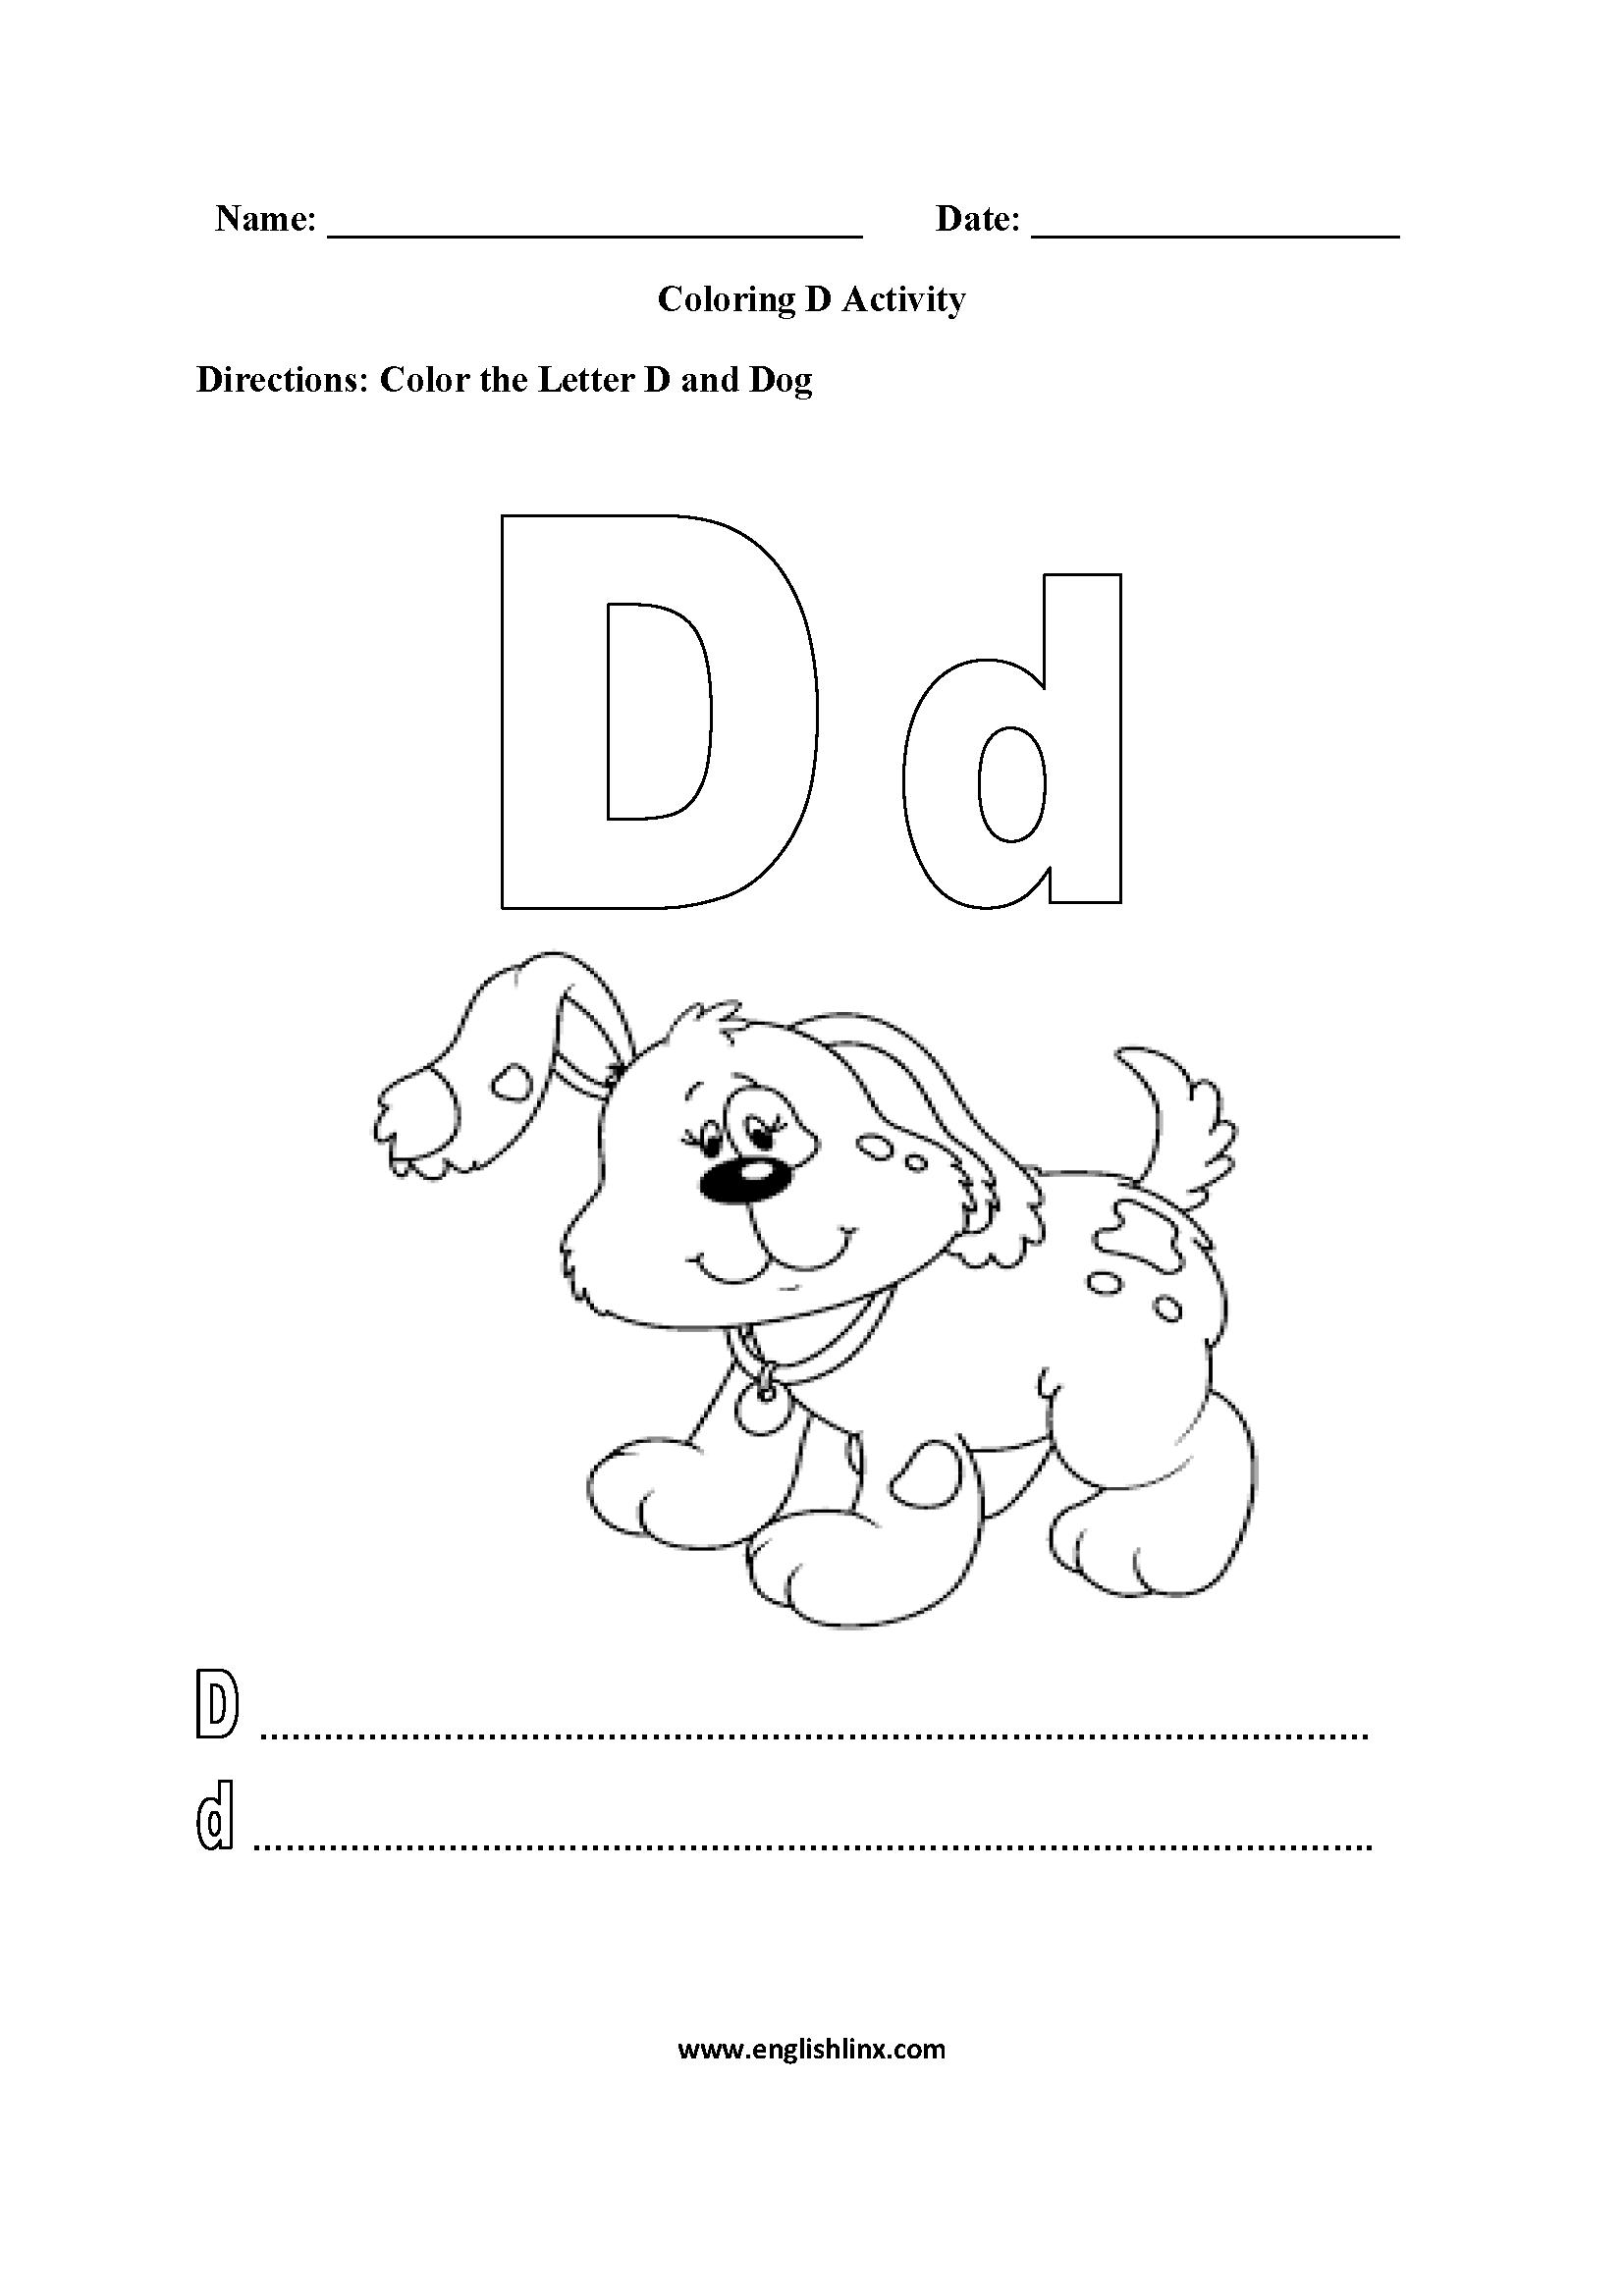 Worksheets Colors D